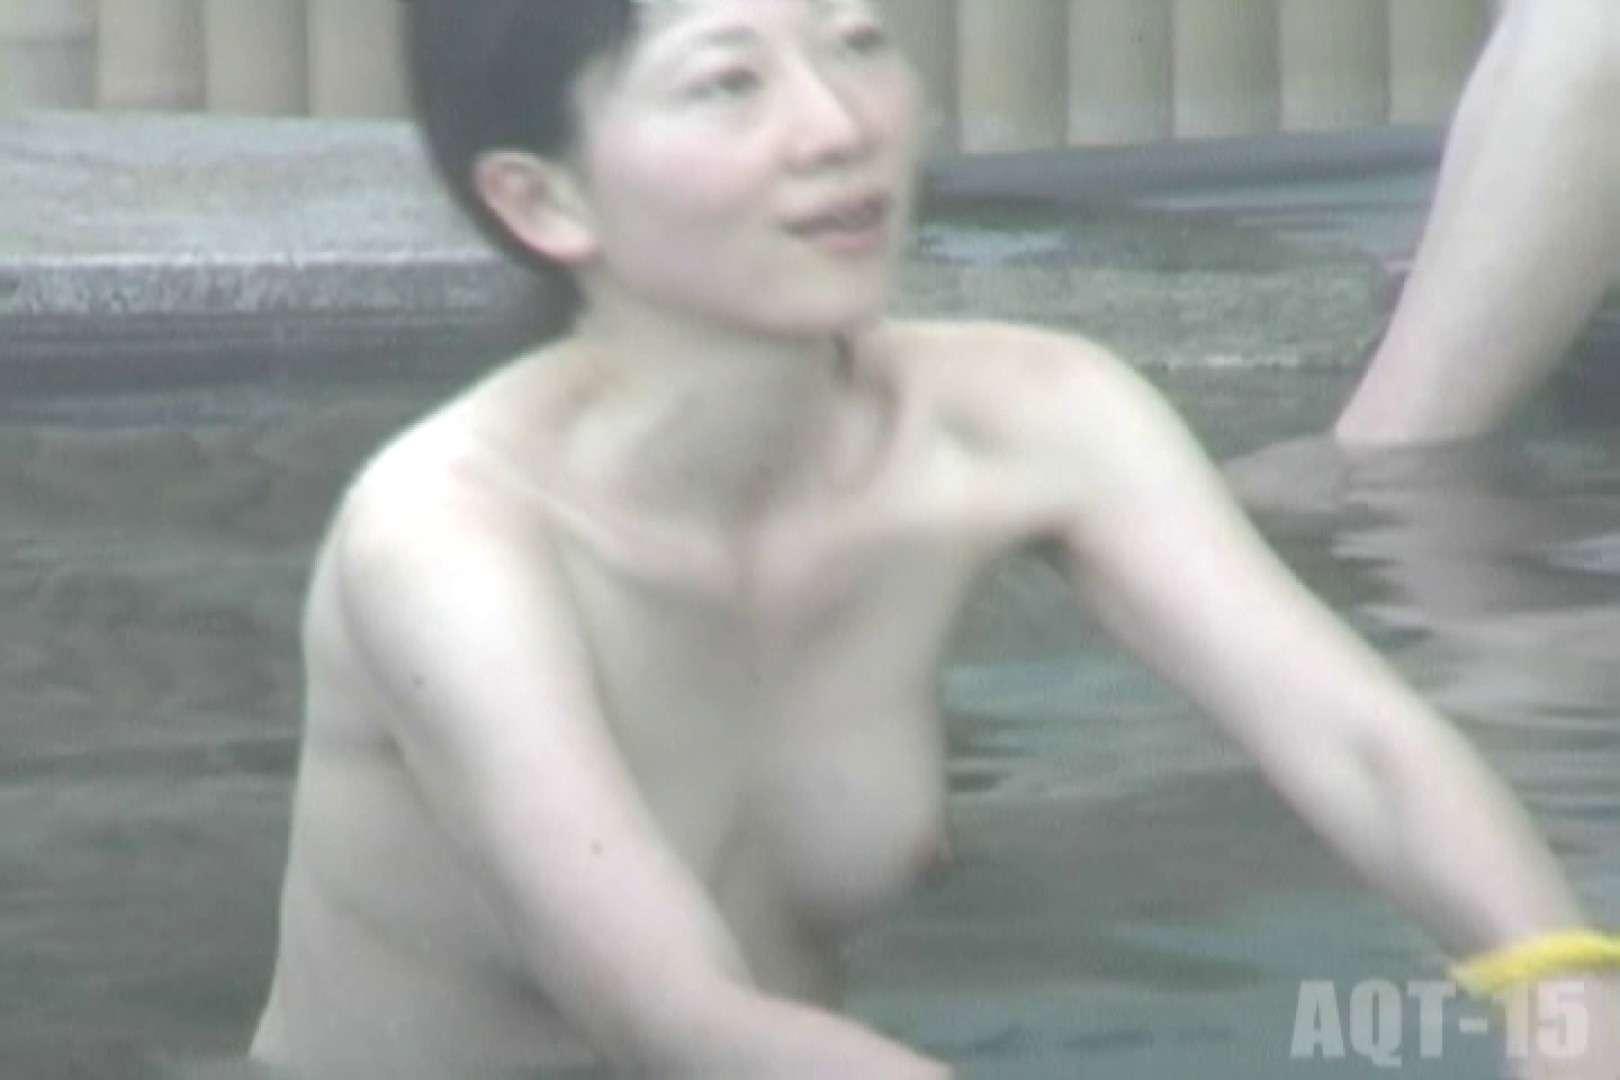 Aquaな露天風呂Vol.835 盗撮 | HなOL  73pic 43